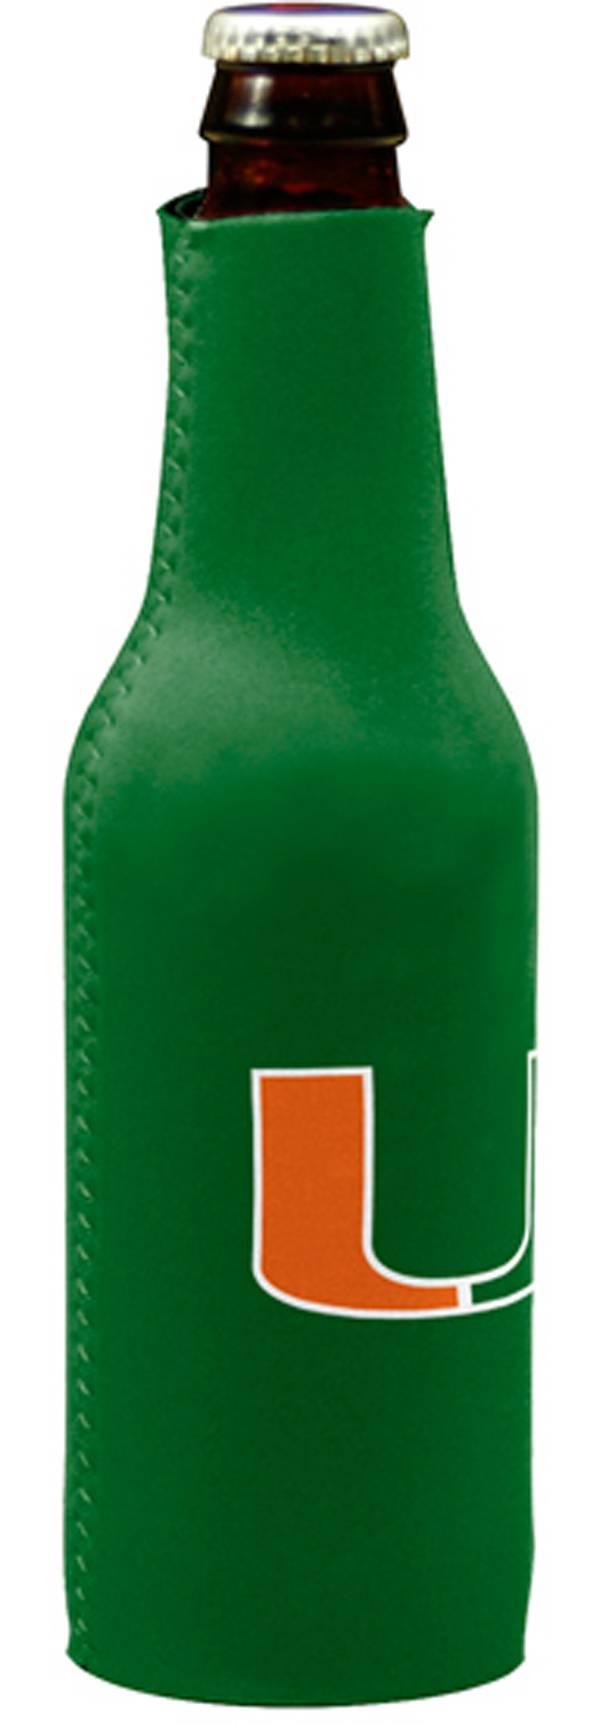 Miami Hurricanes Bottle Koozie product image